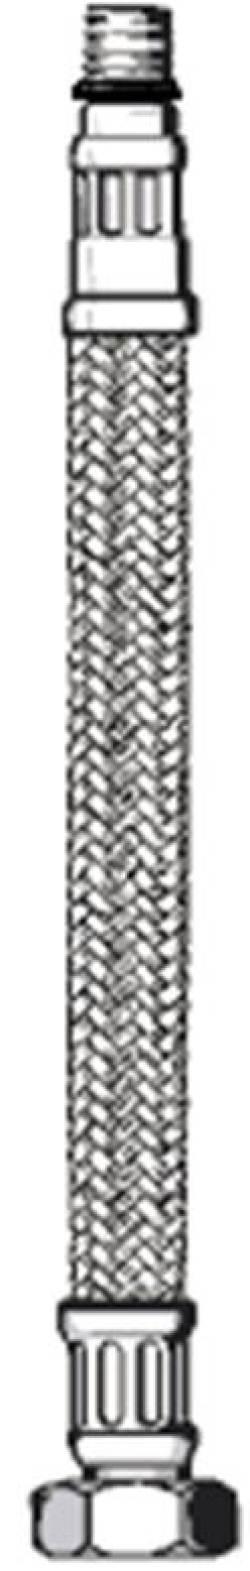 МЕ 5615.3210.40 Meiflex Dn8, М10x1/2ВP, 400mm